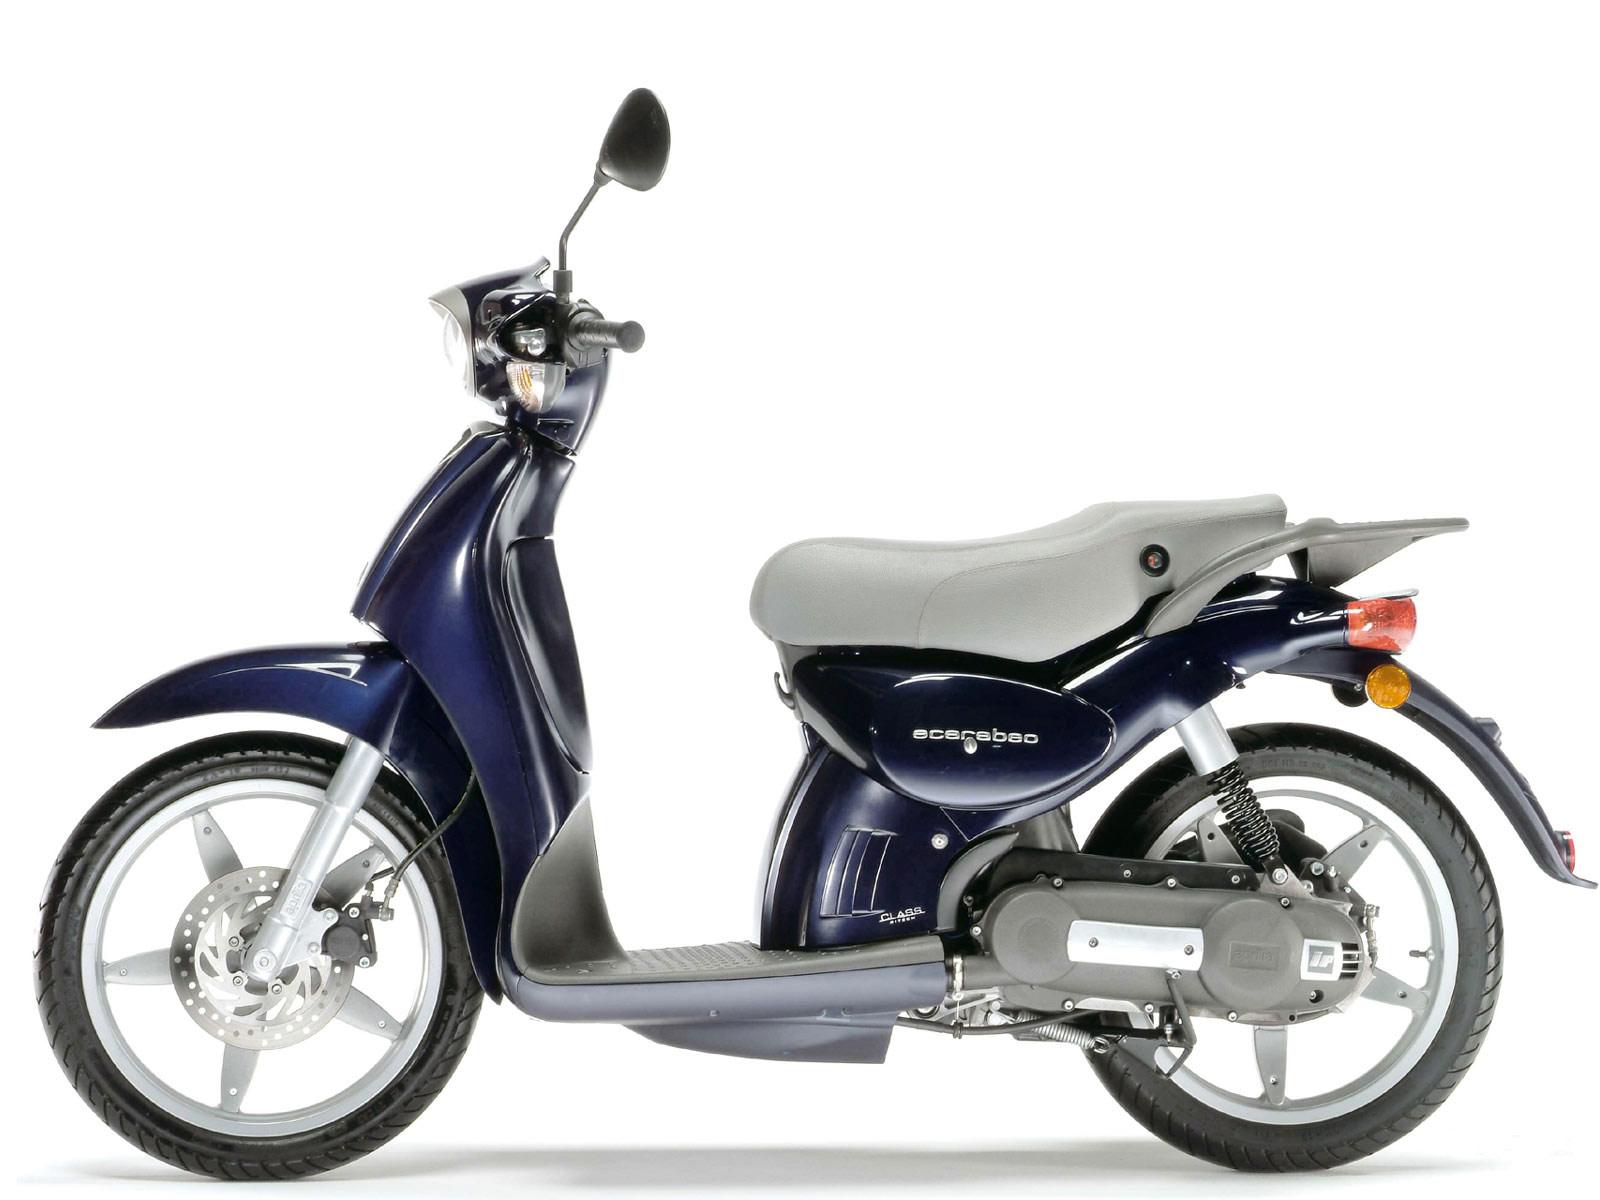 2005 aprilia scarabeo 50 four stroke scooter pictures. Black Bedroom Furniture Sets. Home Design Ideas